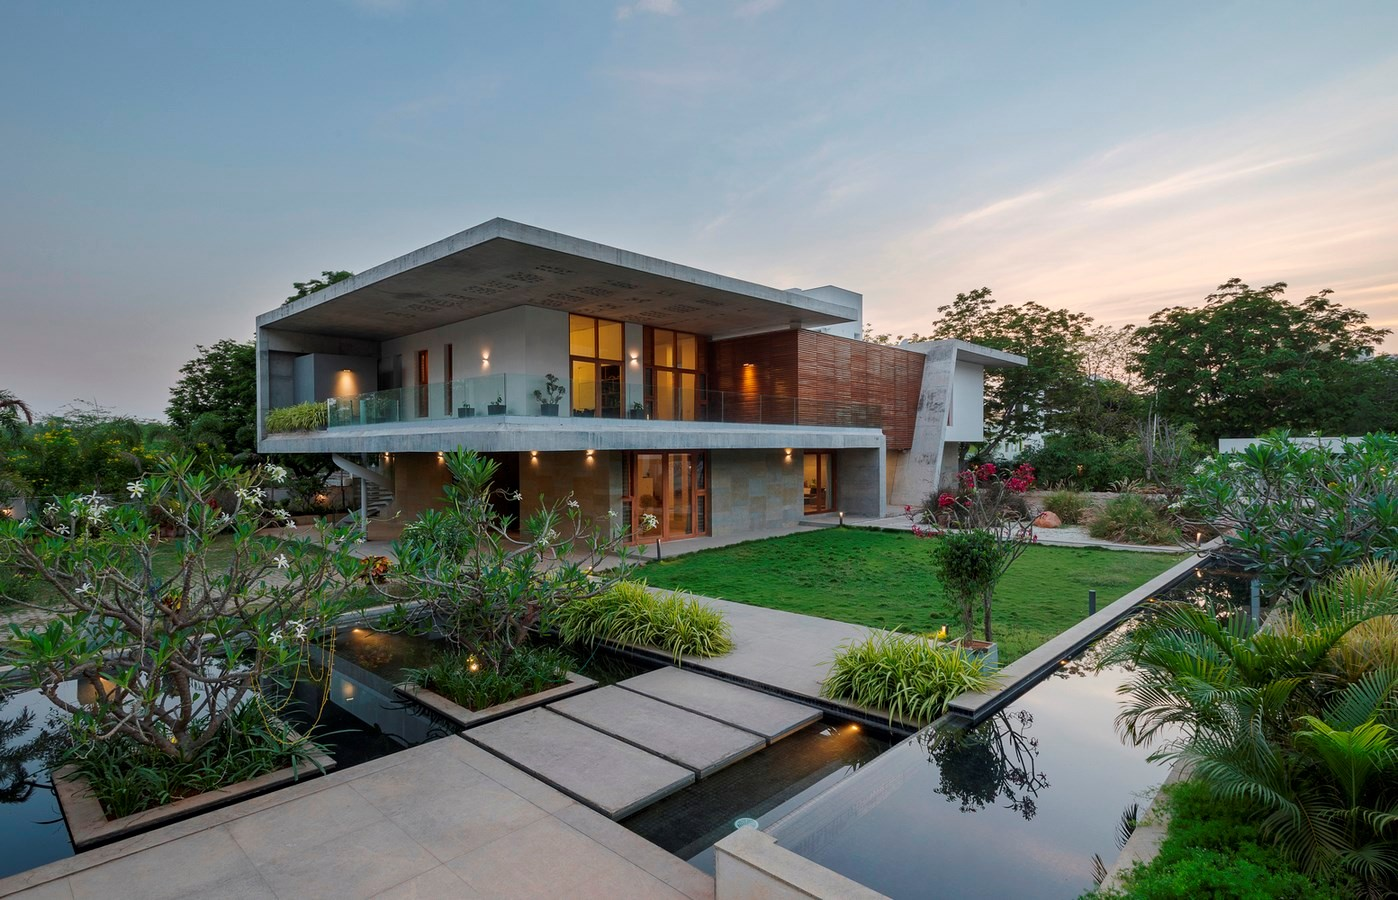 The Deck House - Sheet1